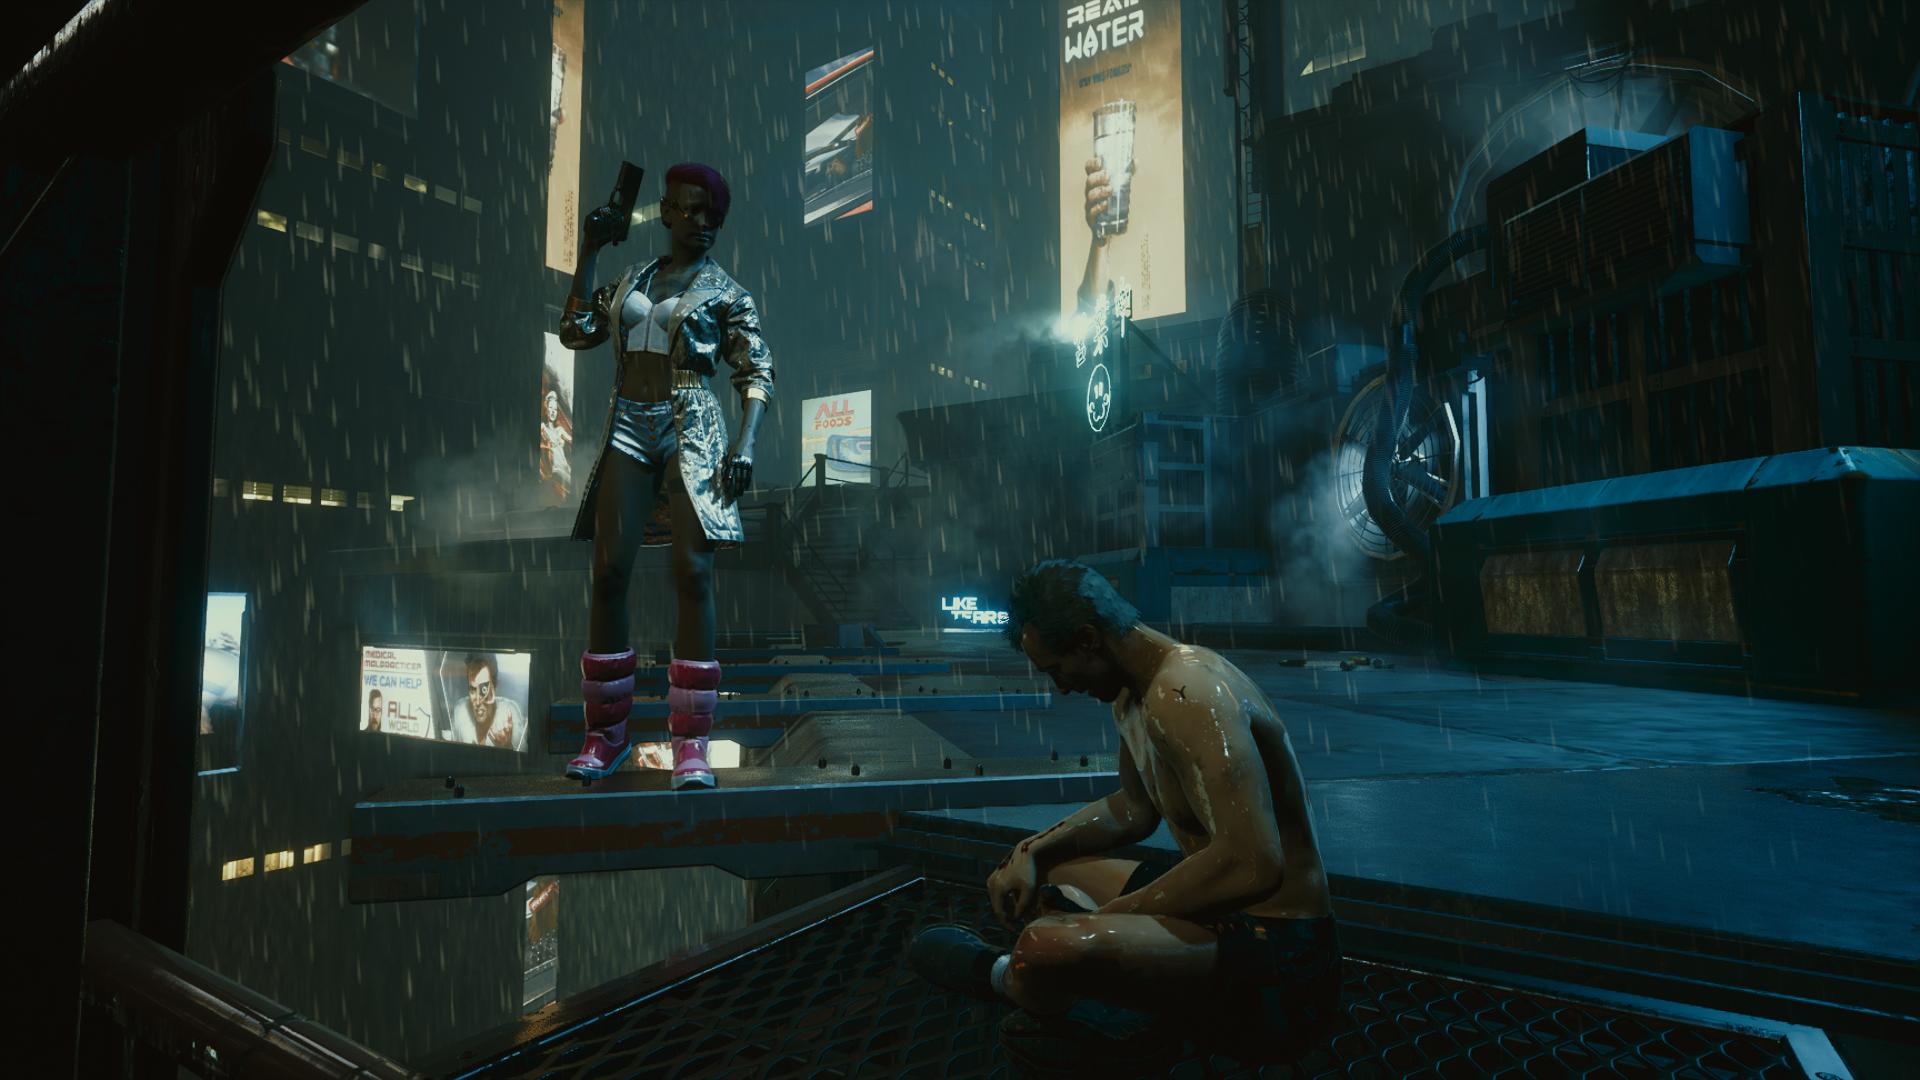 Cyberpunk 2077 Screenshot 2021.01.12 - 00.46.37.39.png - Cyberpunk 2077